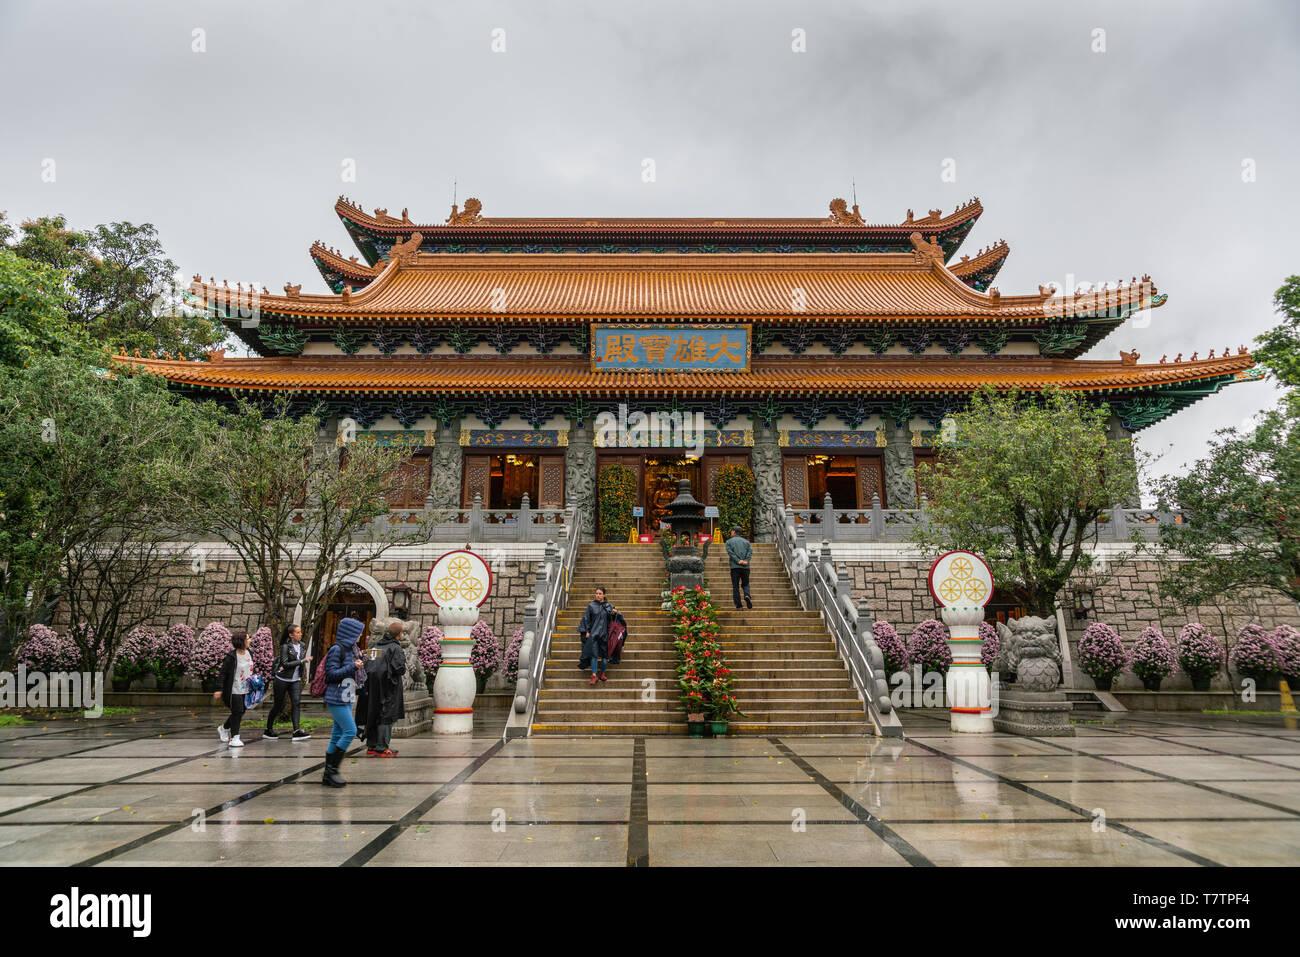 Hong Kong, China - March 7, 2019: Lantau Island. Po Lin Buddhist Monastery. large red-roofed prayer hall under silver sky. Some green foliage. Decorat - Stock Image